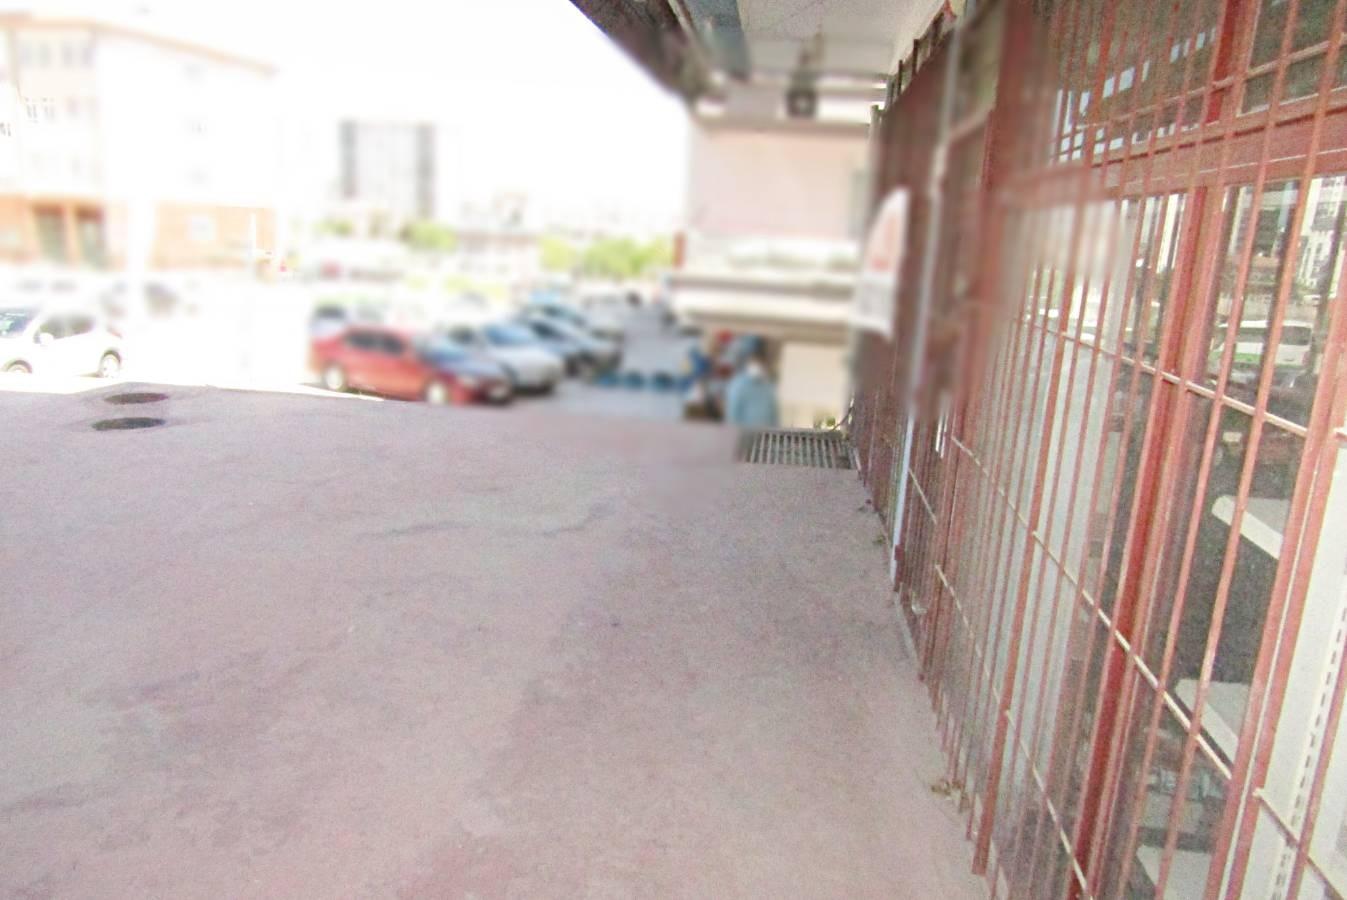 SR EMLAK'TAN TOPÇU MAH'DE 120 m² KÖŞEBAŞI KİRALIK DÜKKAN